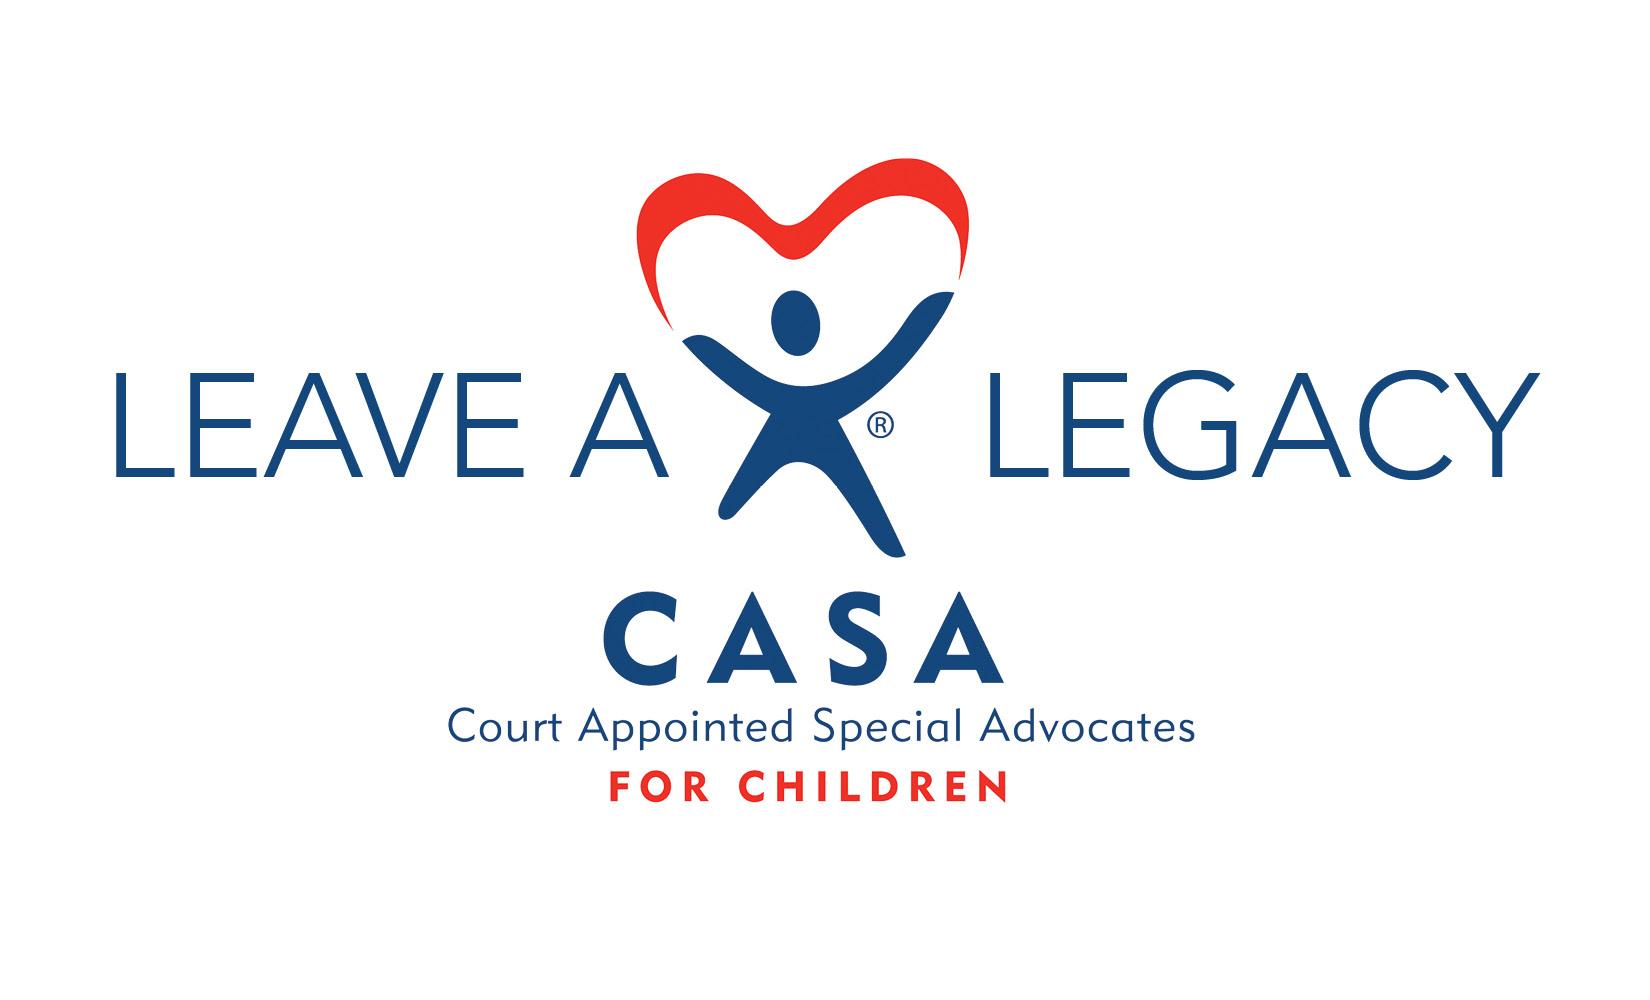 LEAVE A LEGACY and CASA logo 2.jpg